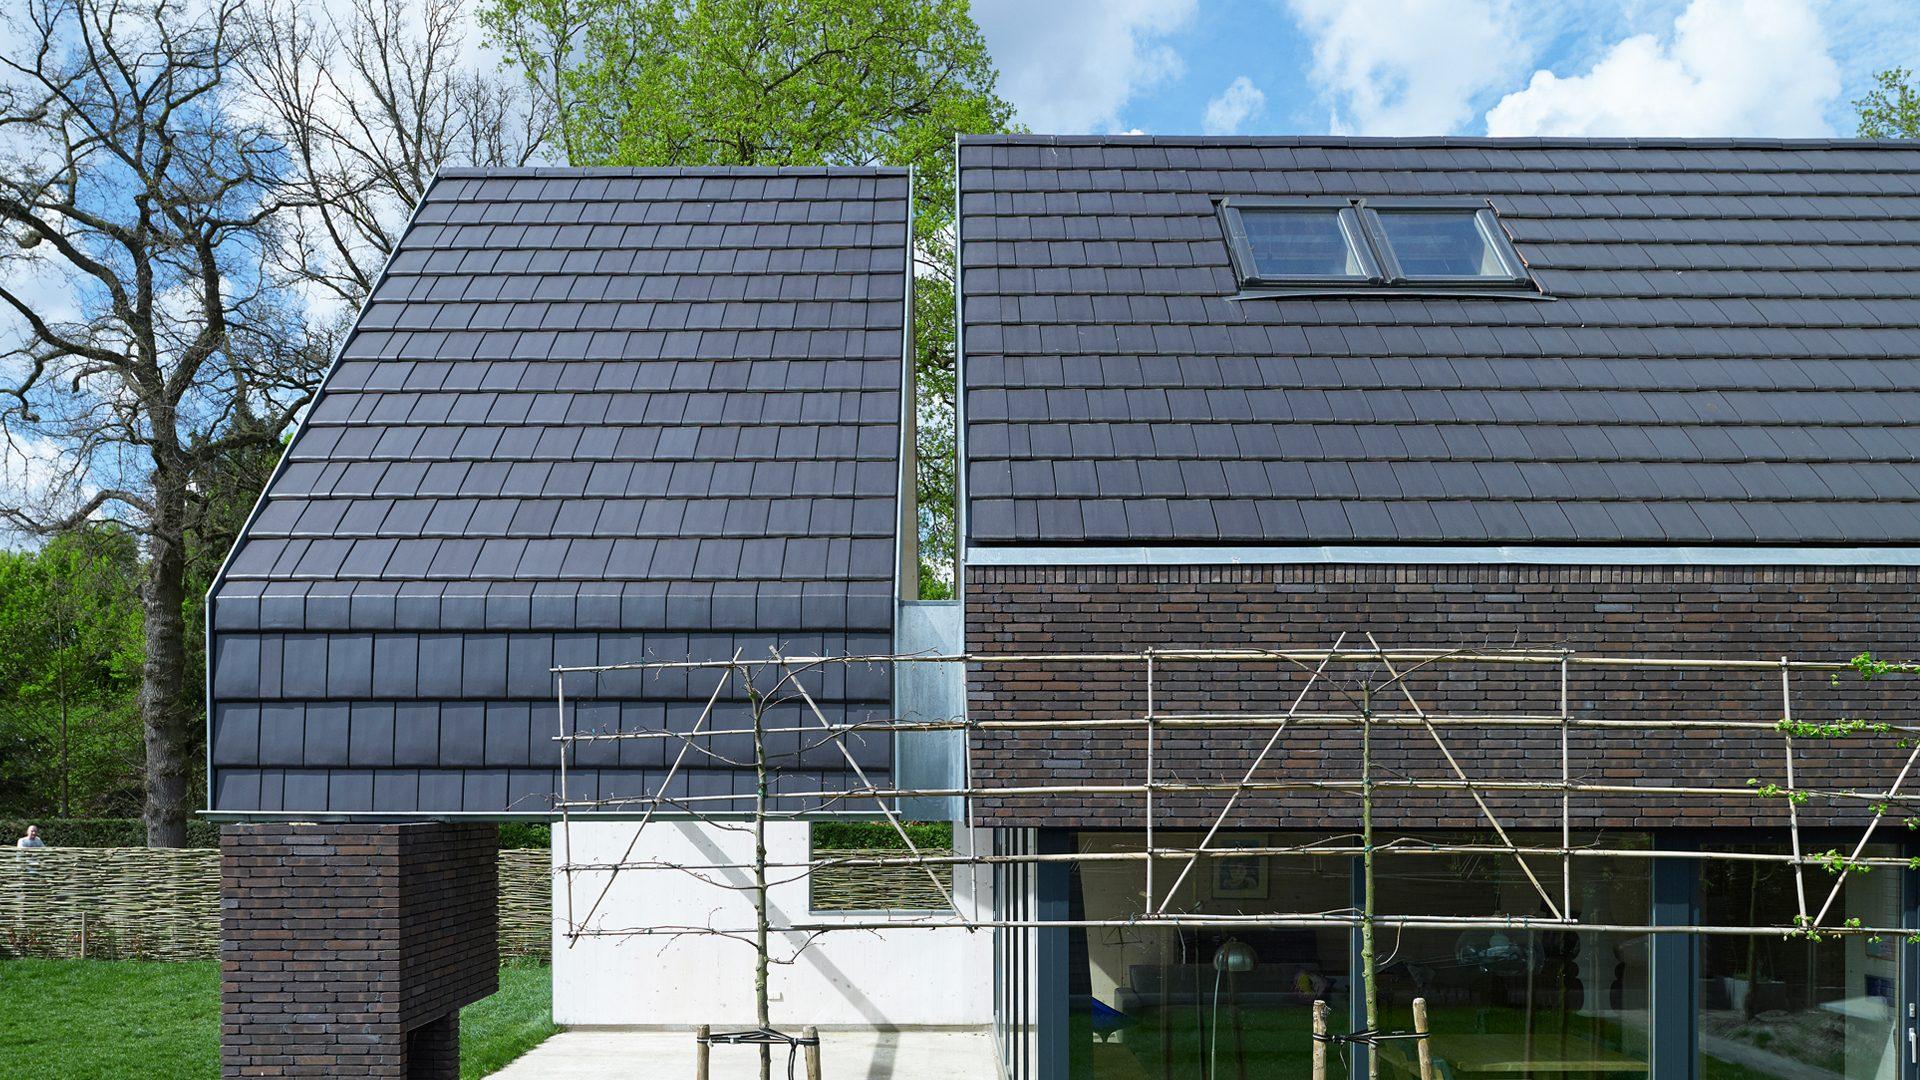 architectuur dakpan baksteen dak detail passief bouwen